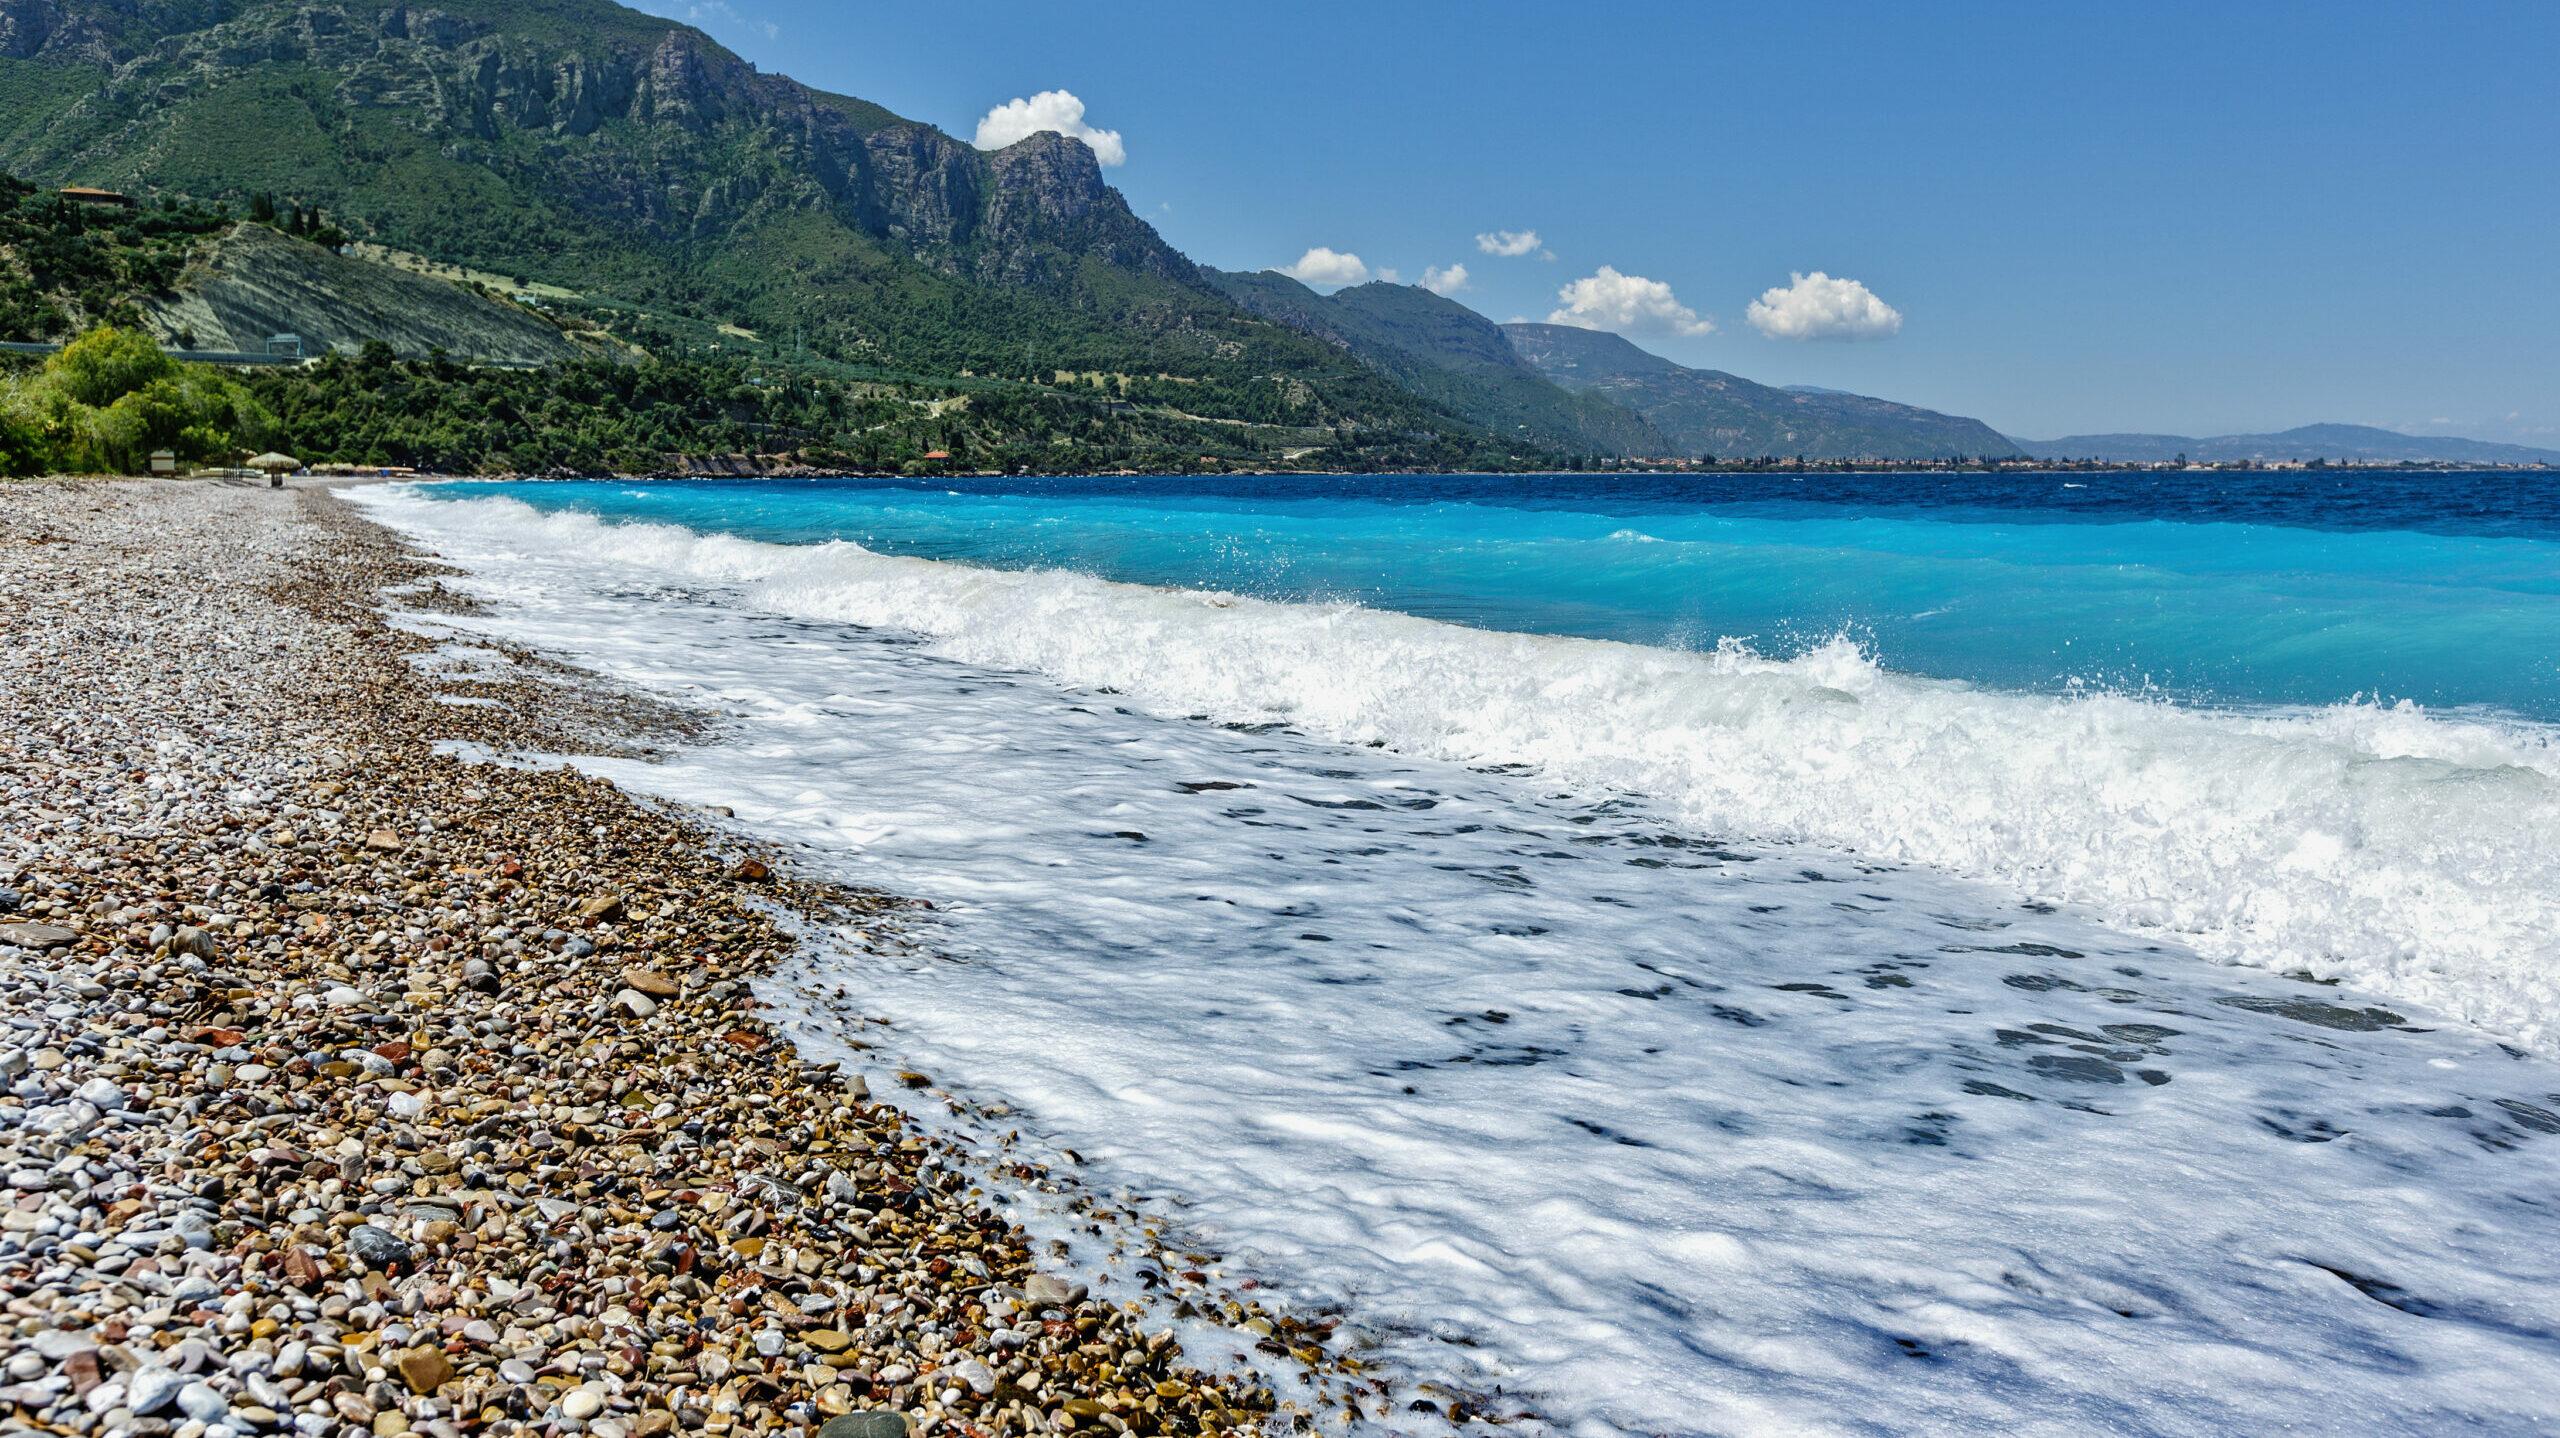 Diakopto beach:  a gem on the Corinthian Gulf